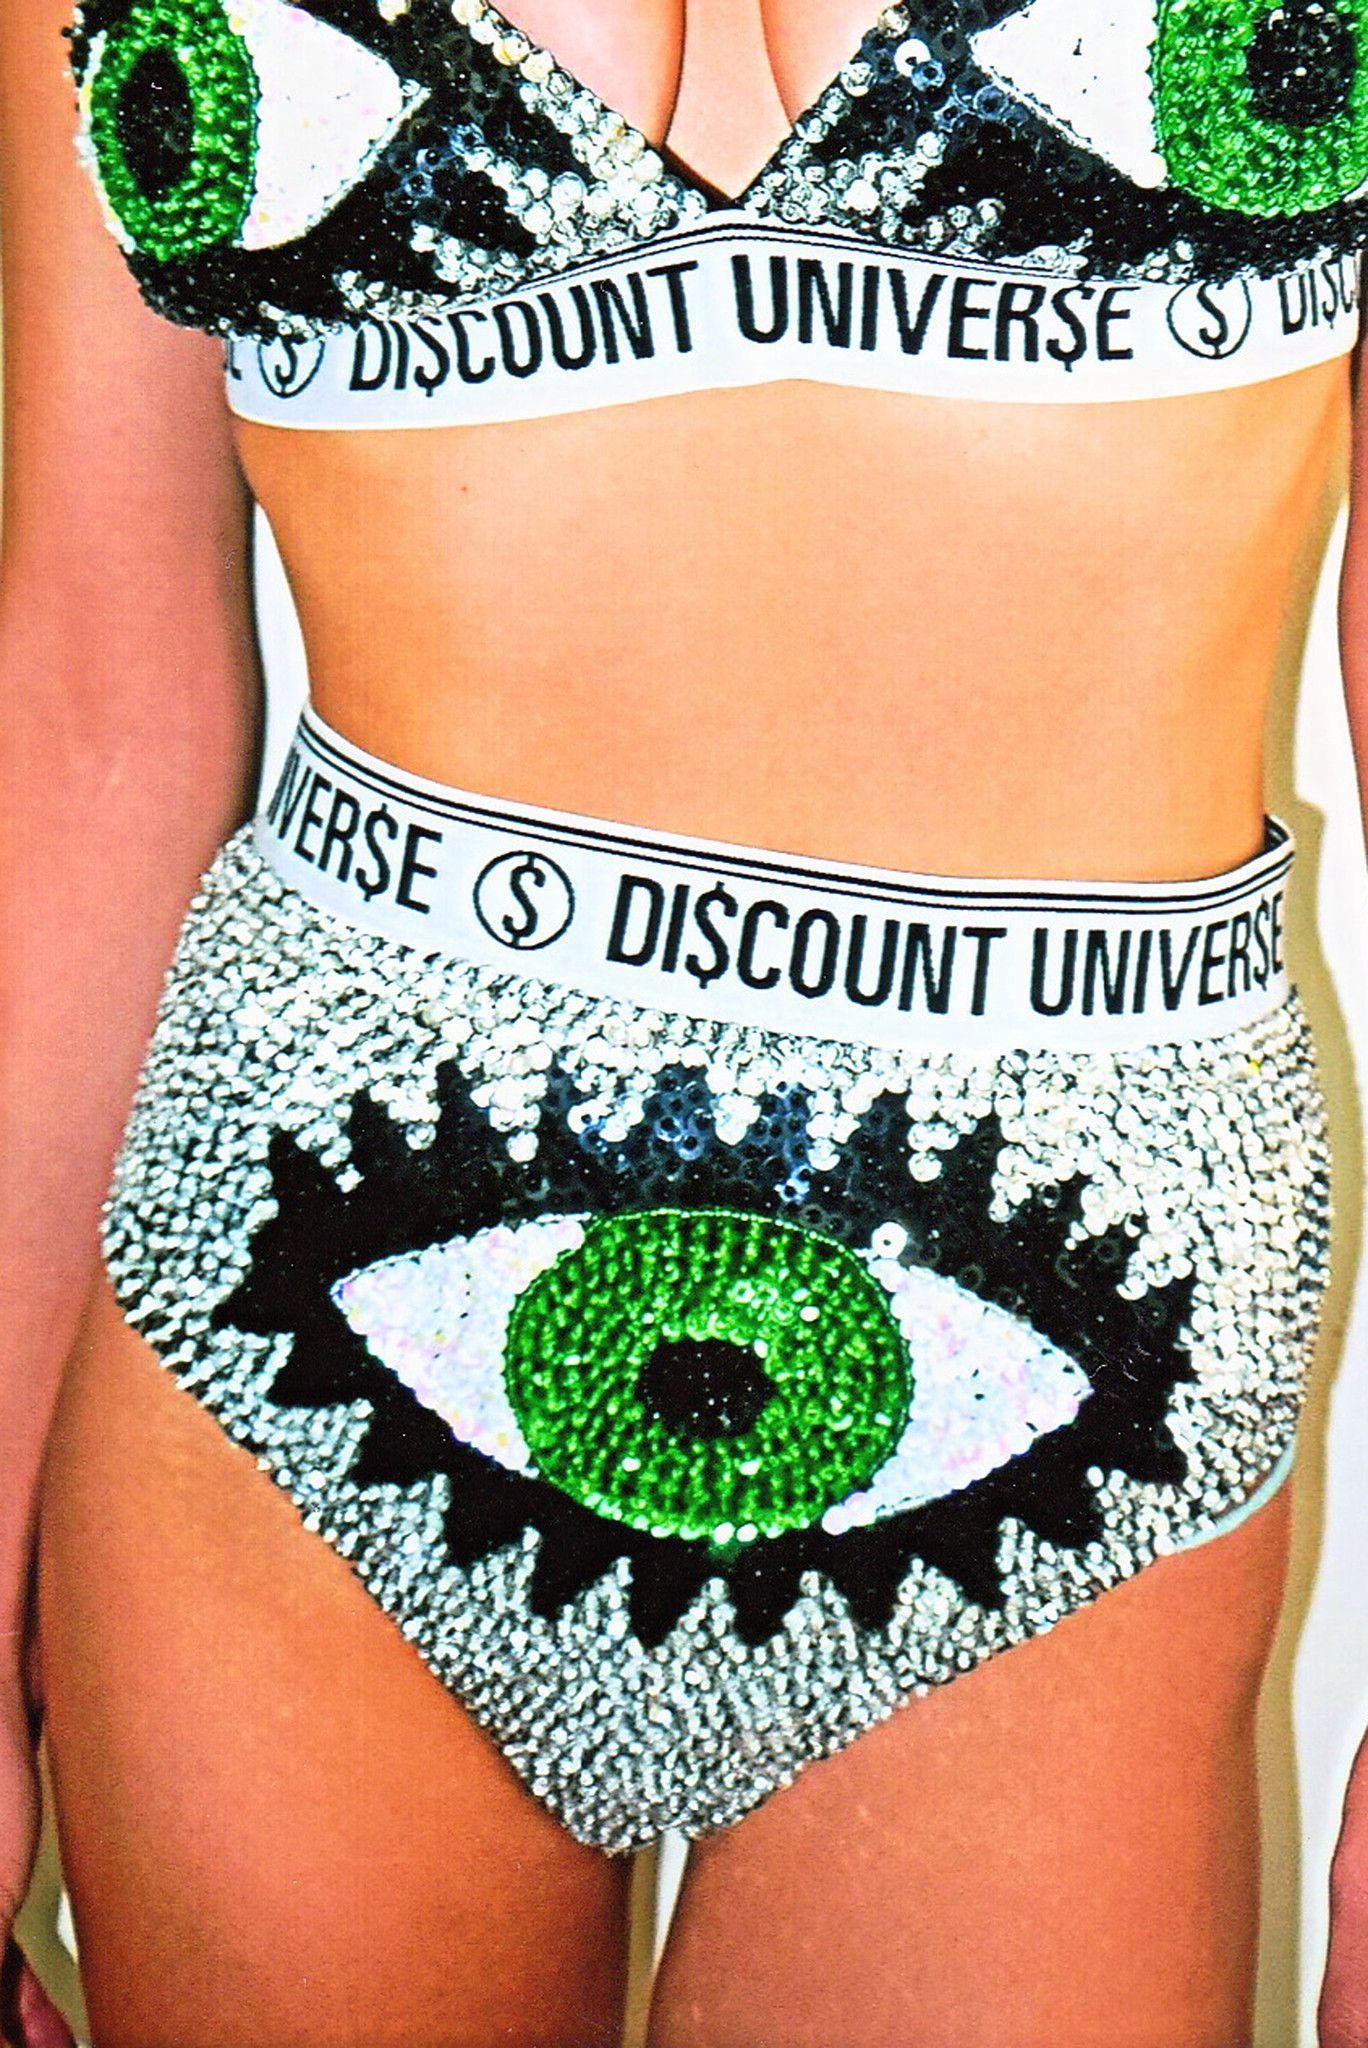 silver evil eye bikini bottoms, silver evil eye bikini, silver evil eye bottoms, silver evil eye, sequinned evil eye, evil eye, sequins, evil eye bikini, sequinned evil eye bikini, evil eye, green and silver evil eye, silver sequins, sequinned bikini, undies, sequinned undies, discount universe, di$count universe